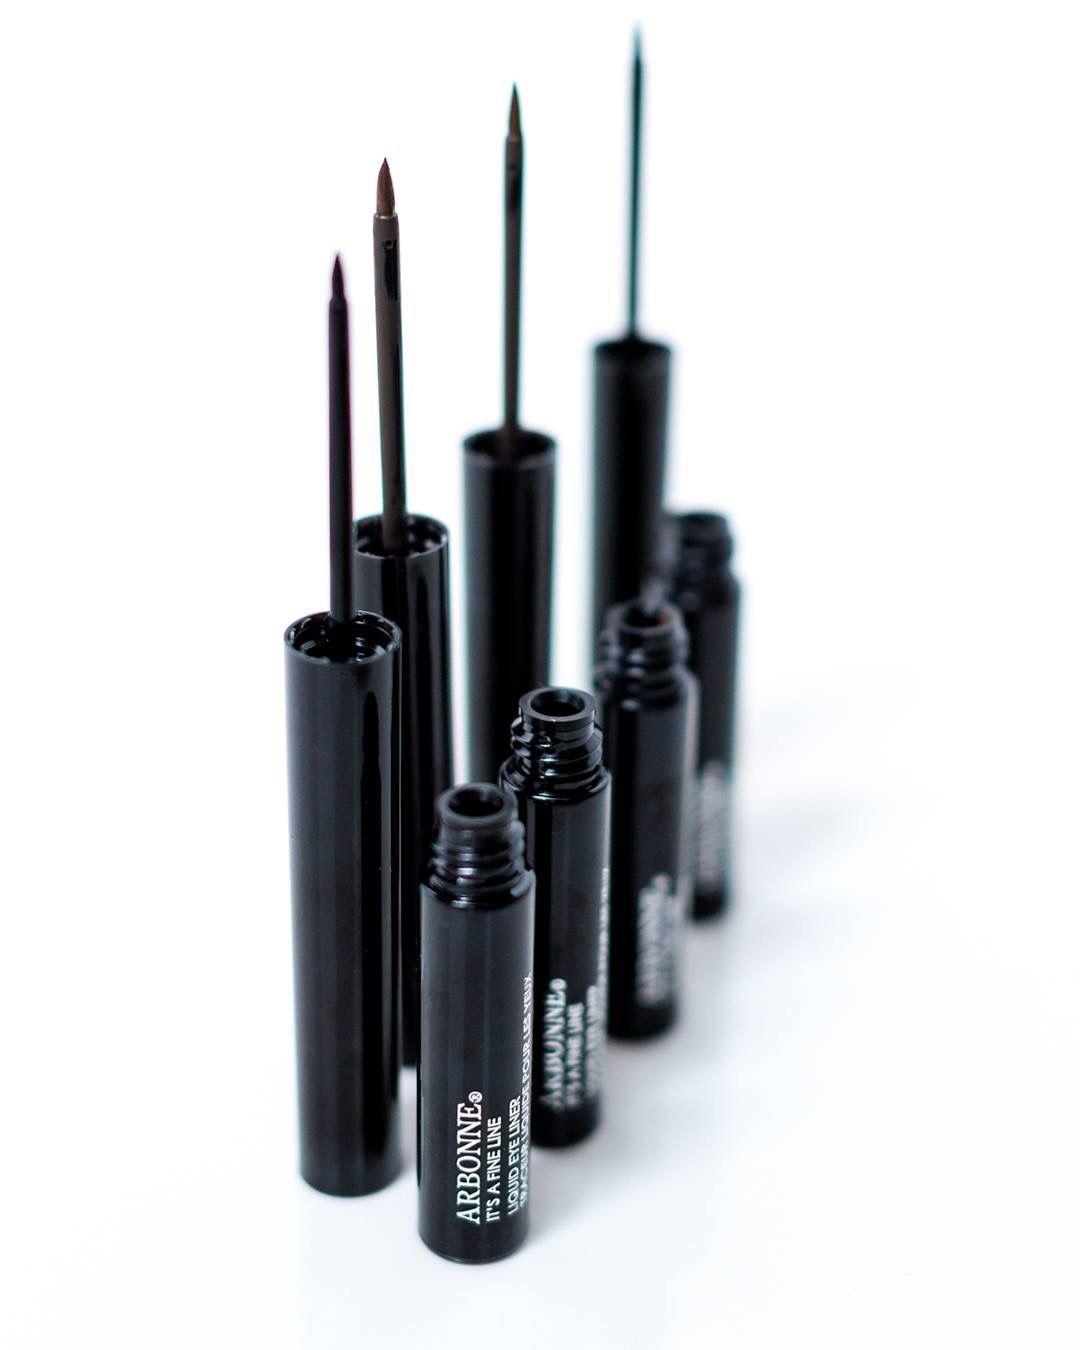 964276f524e Arbonne Makeup, Eye Makeup Tips, Draw, Body Care, Eyeliner, Cosmetics,